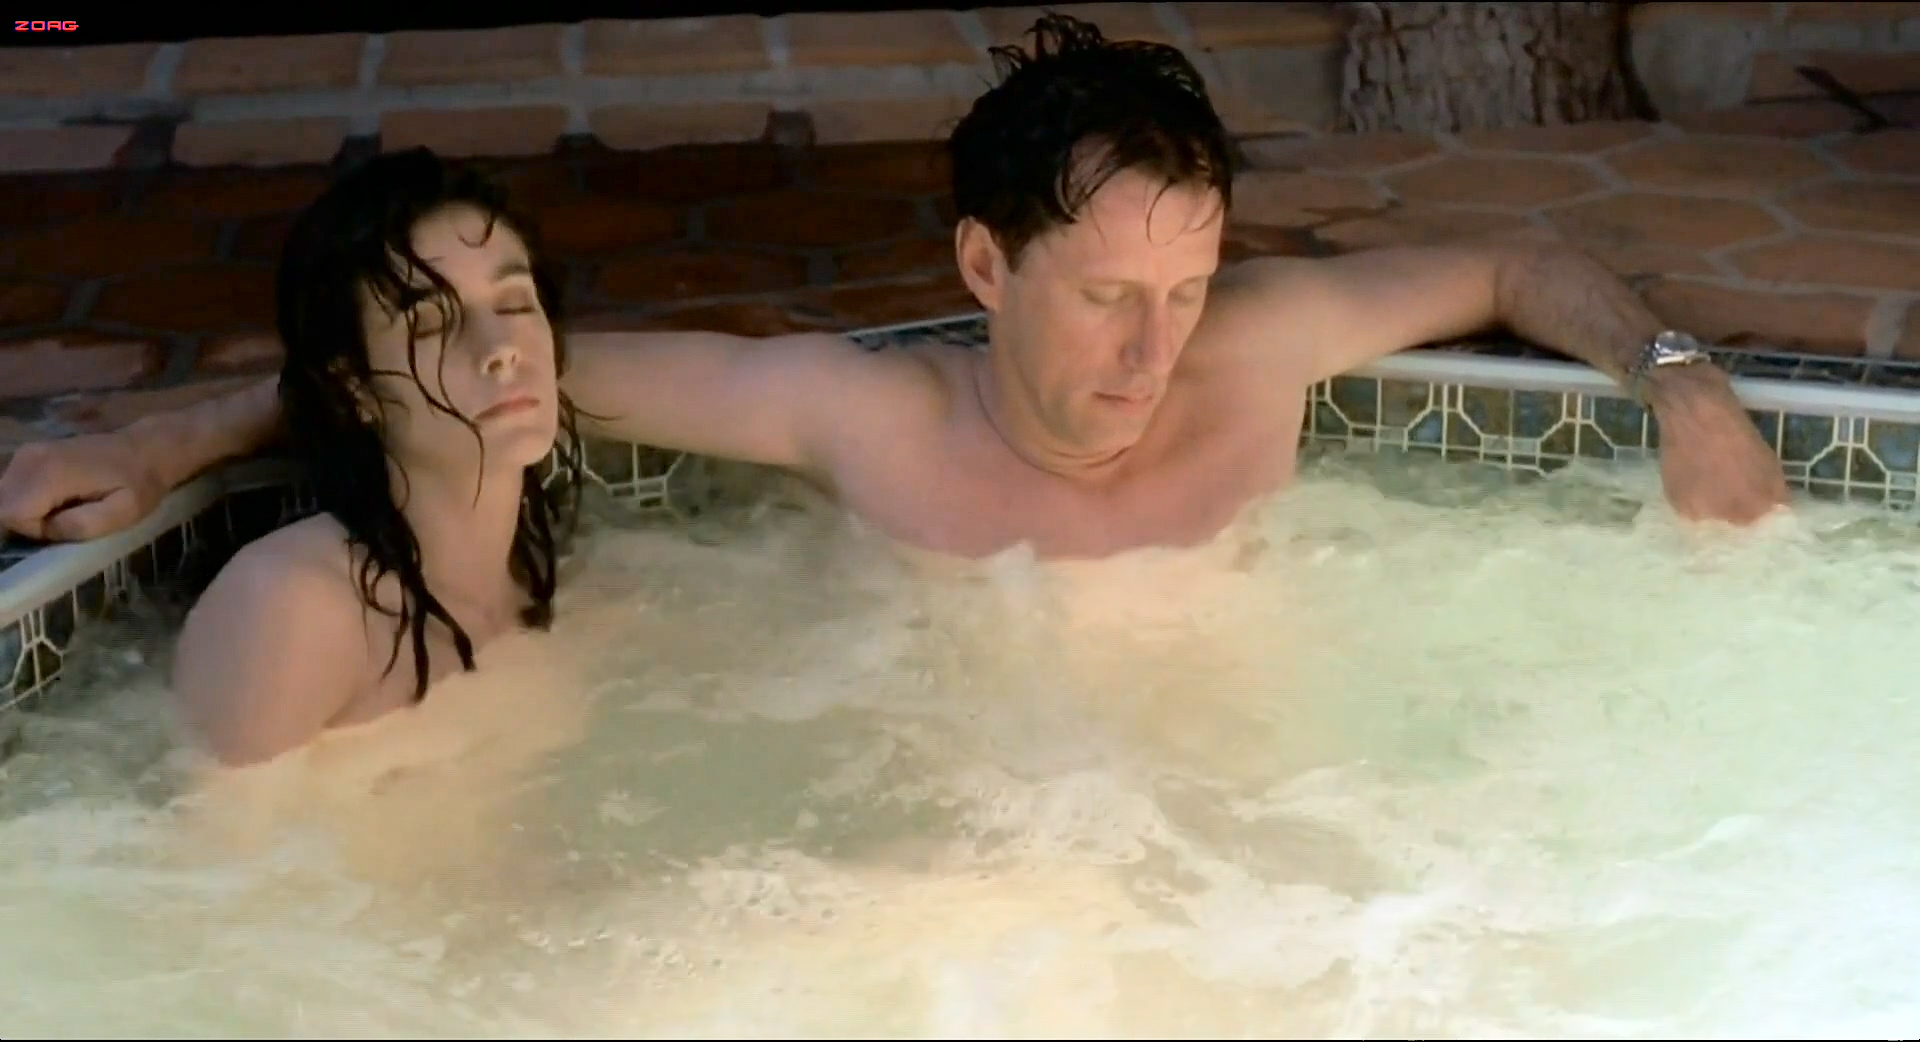 Skinny dipping pool sex